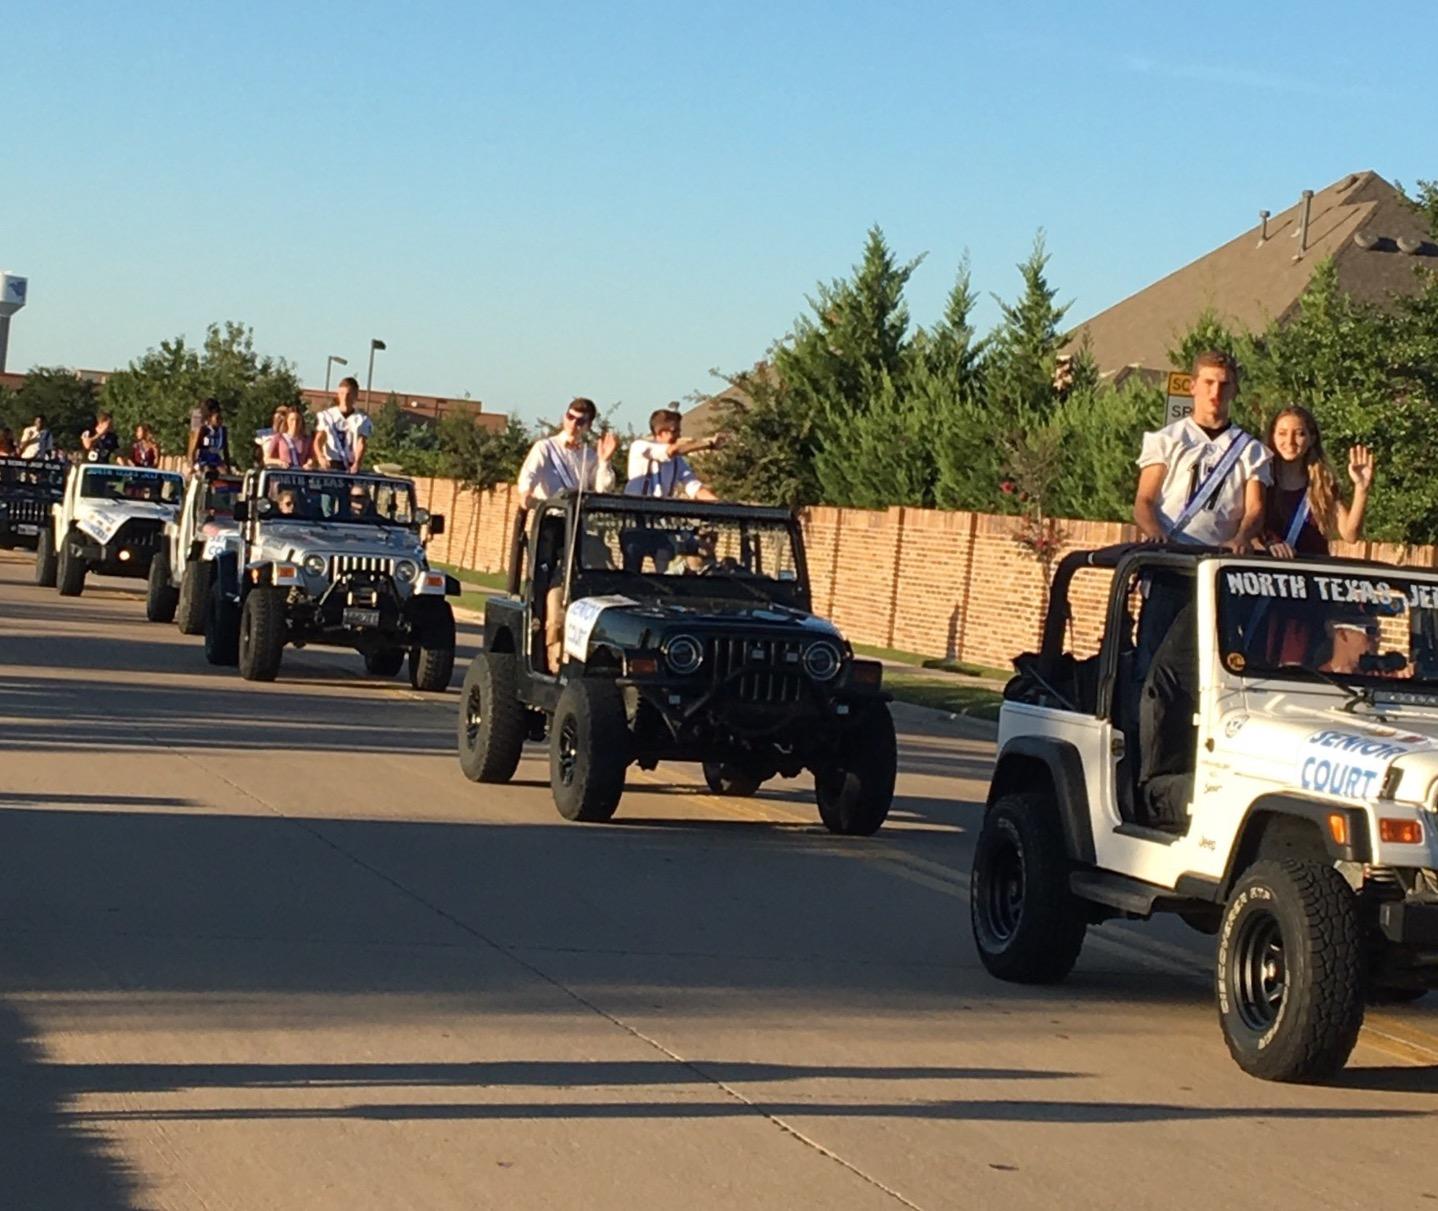 100516-cc-jeep-on-parade-1